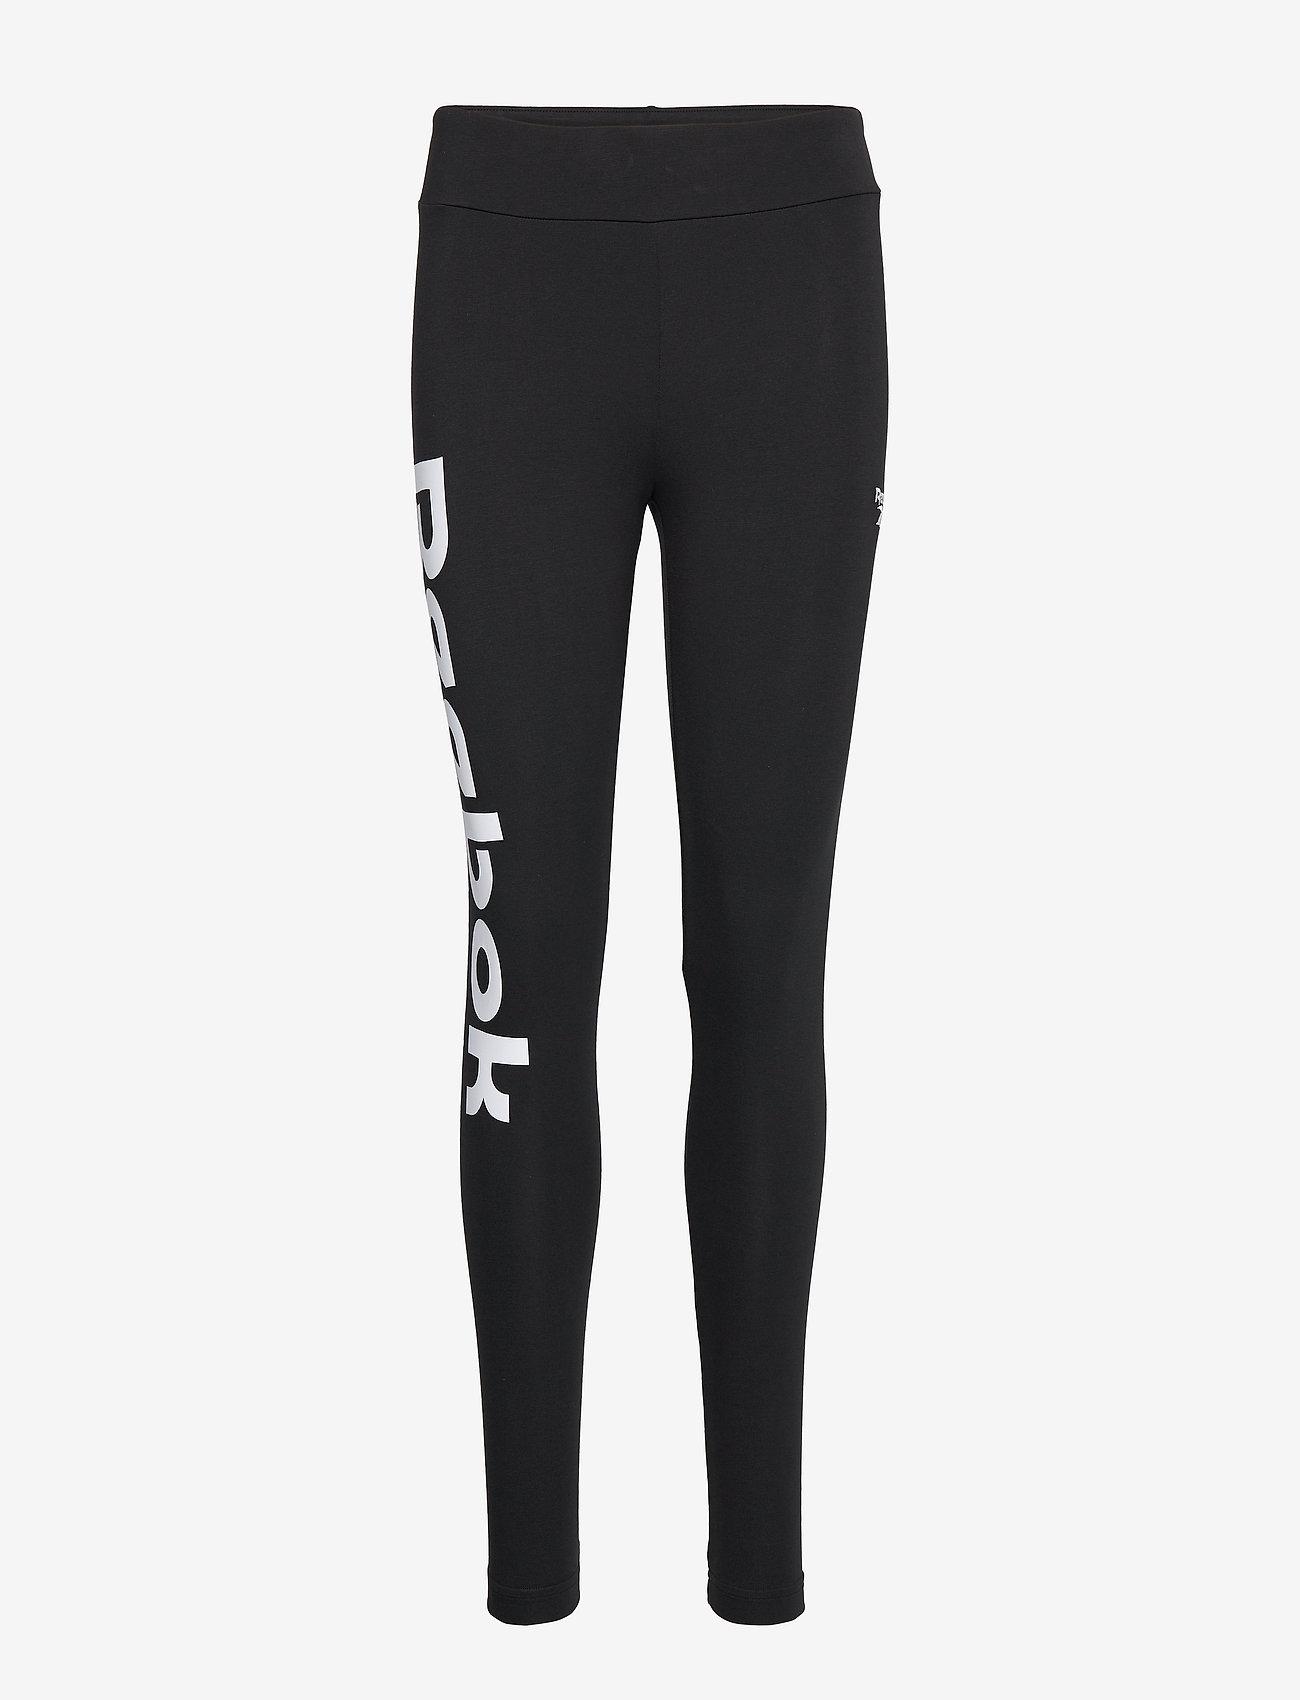 Reebok Classics - CL REEBOK LEGGING - leggings - black - 1